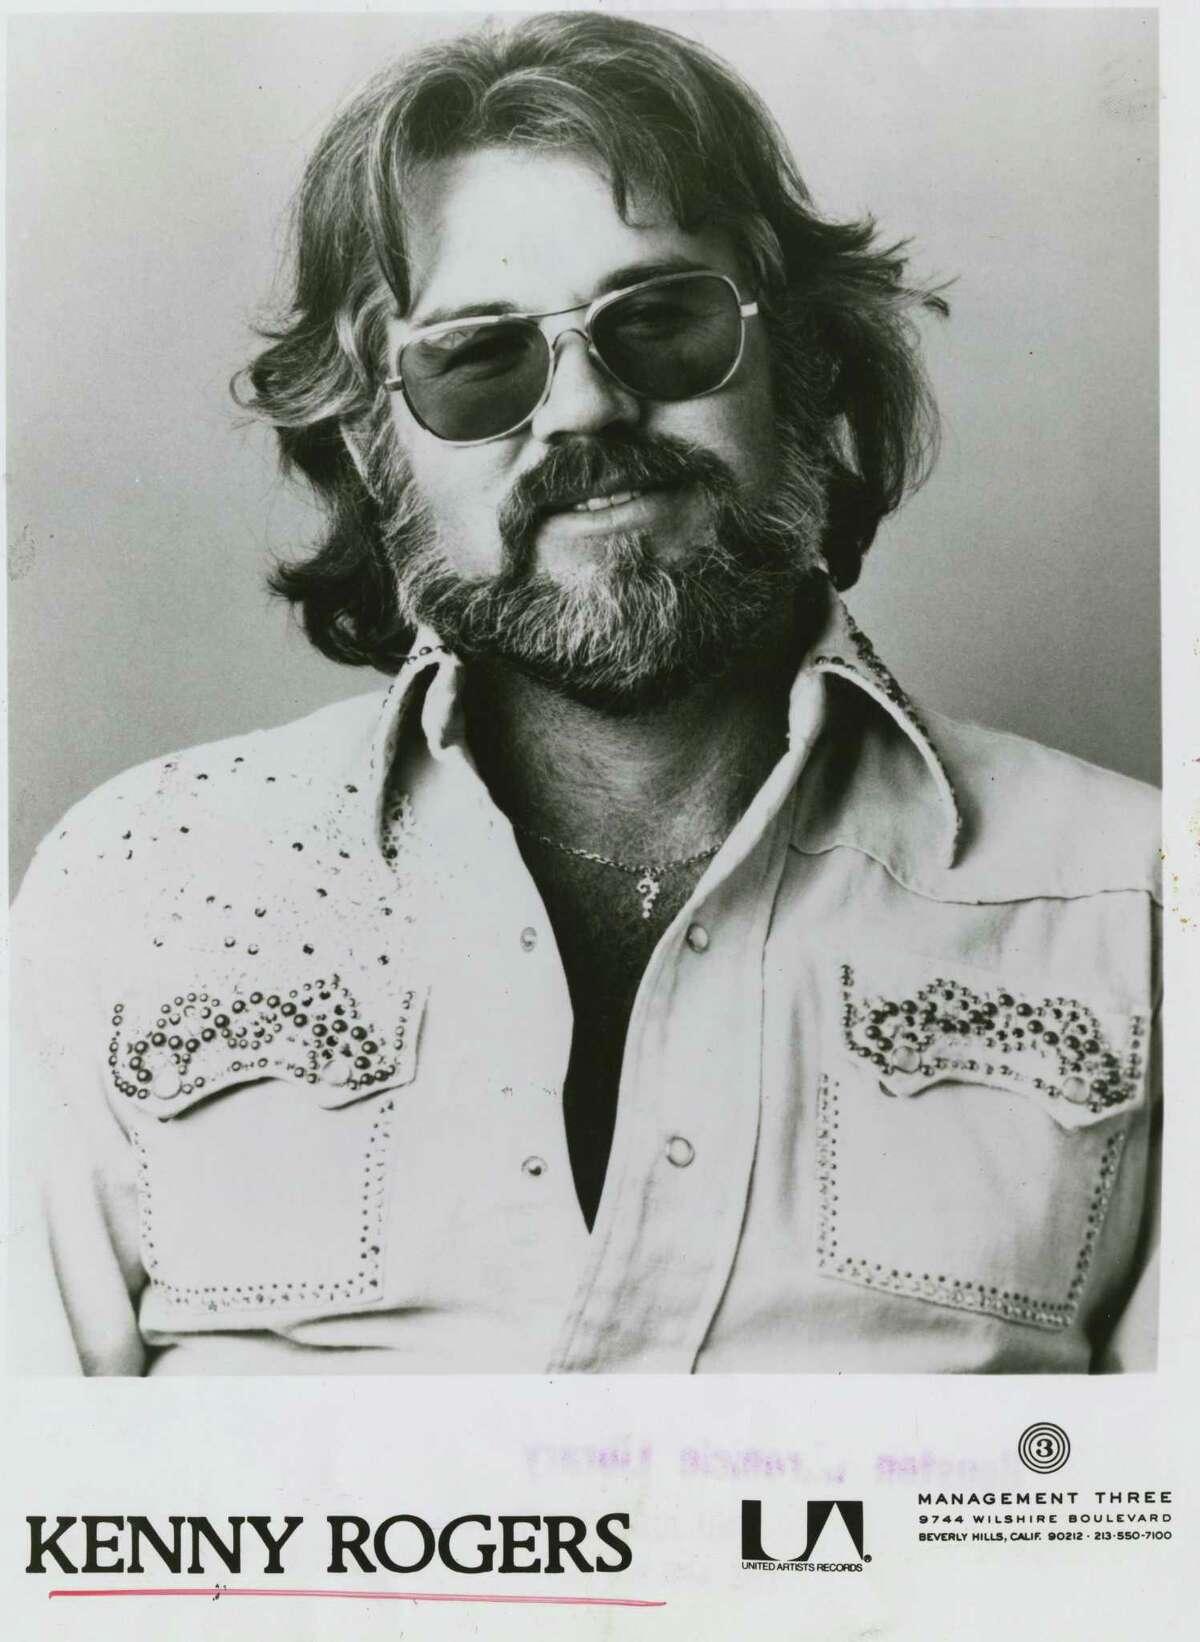 1977 - singer Kenny Rogers